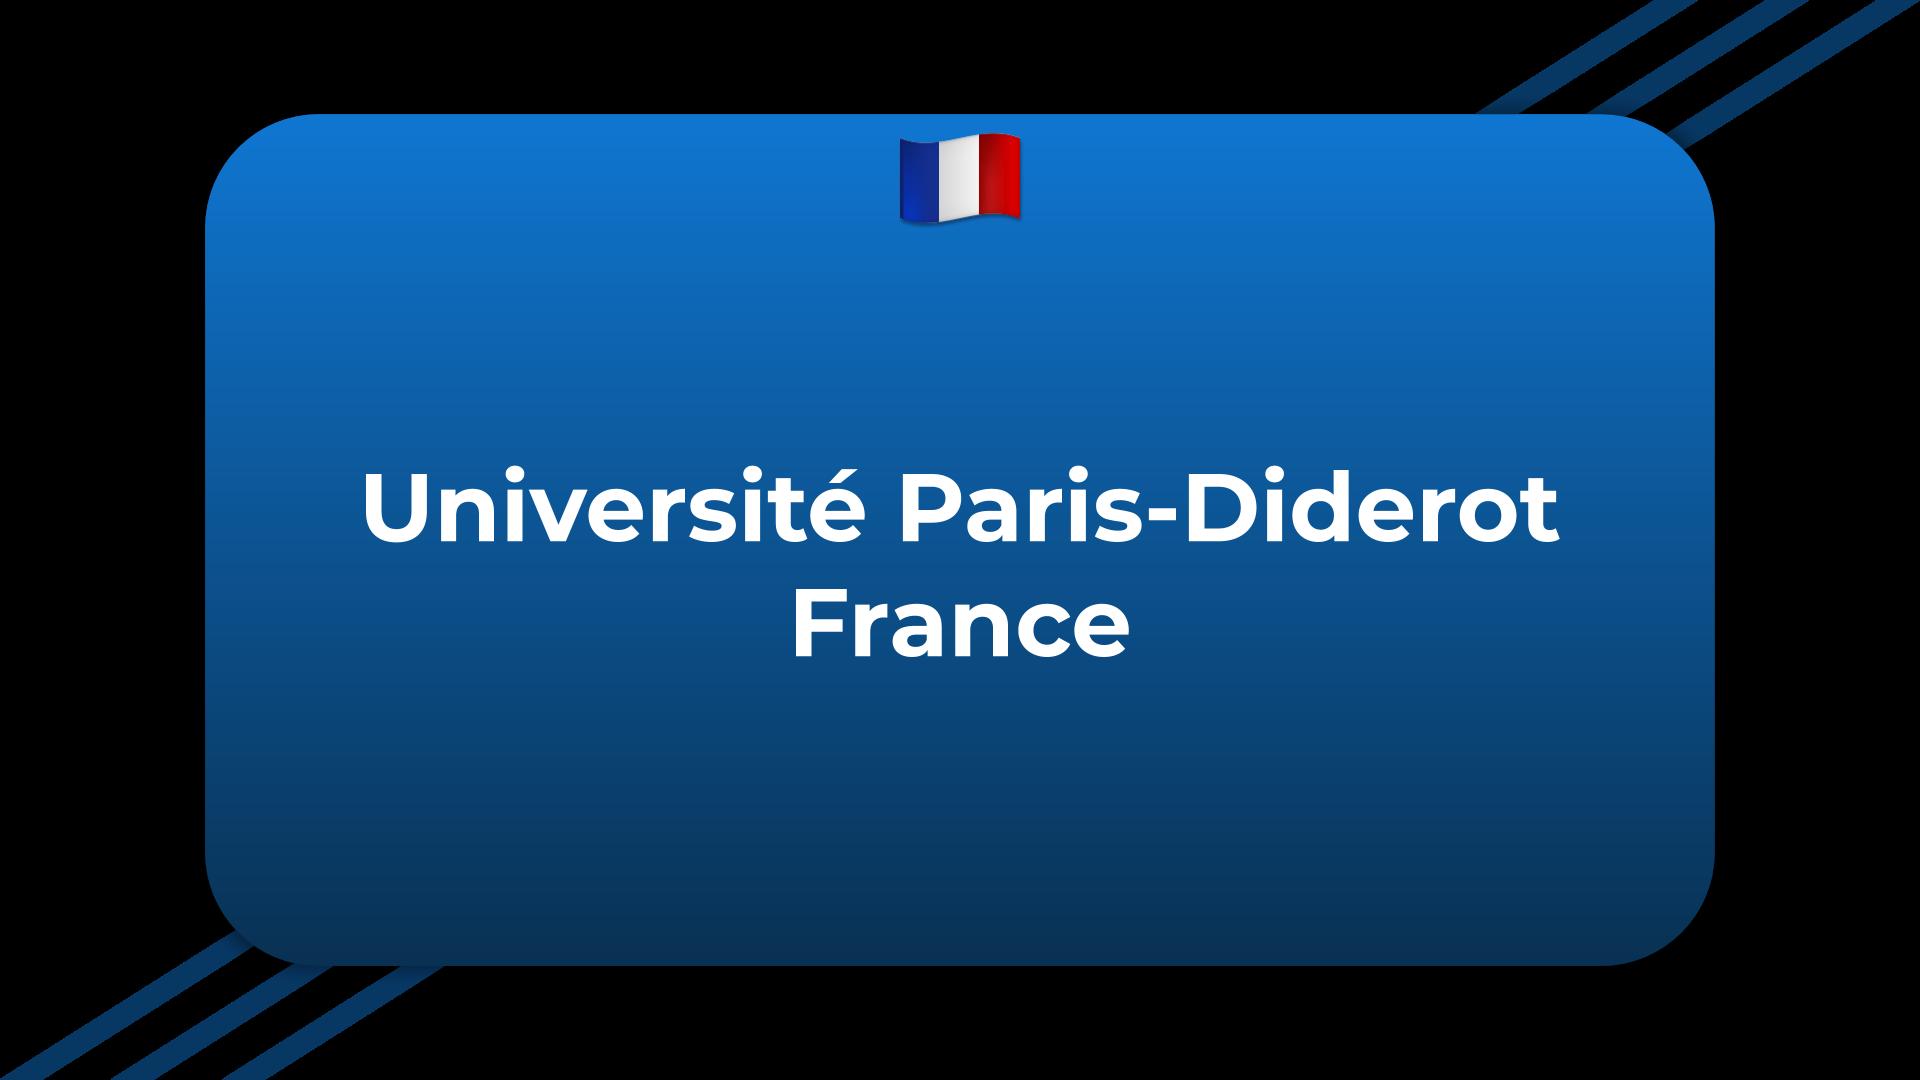 Université Paris-Diderot